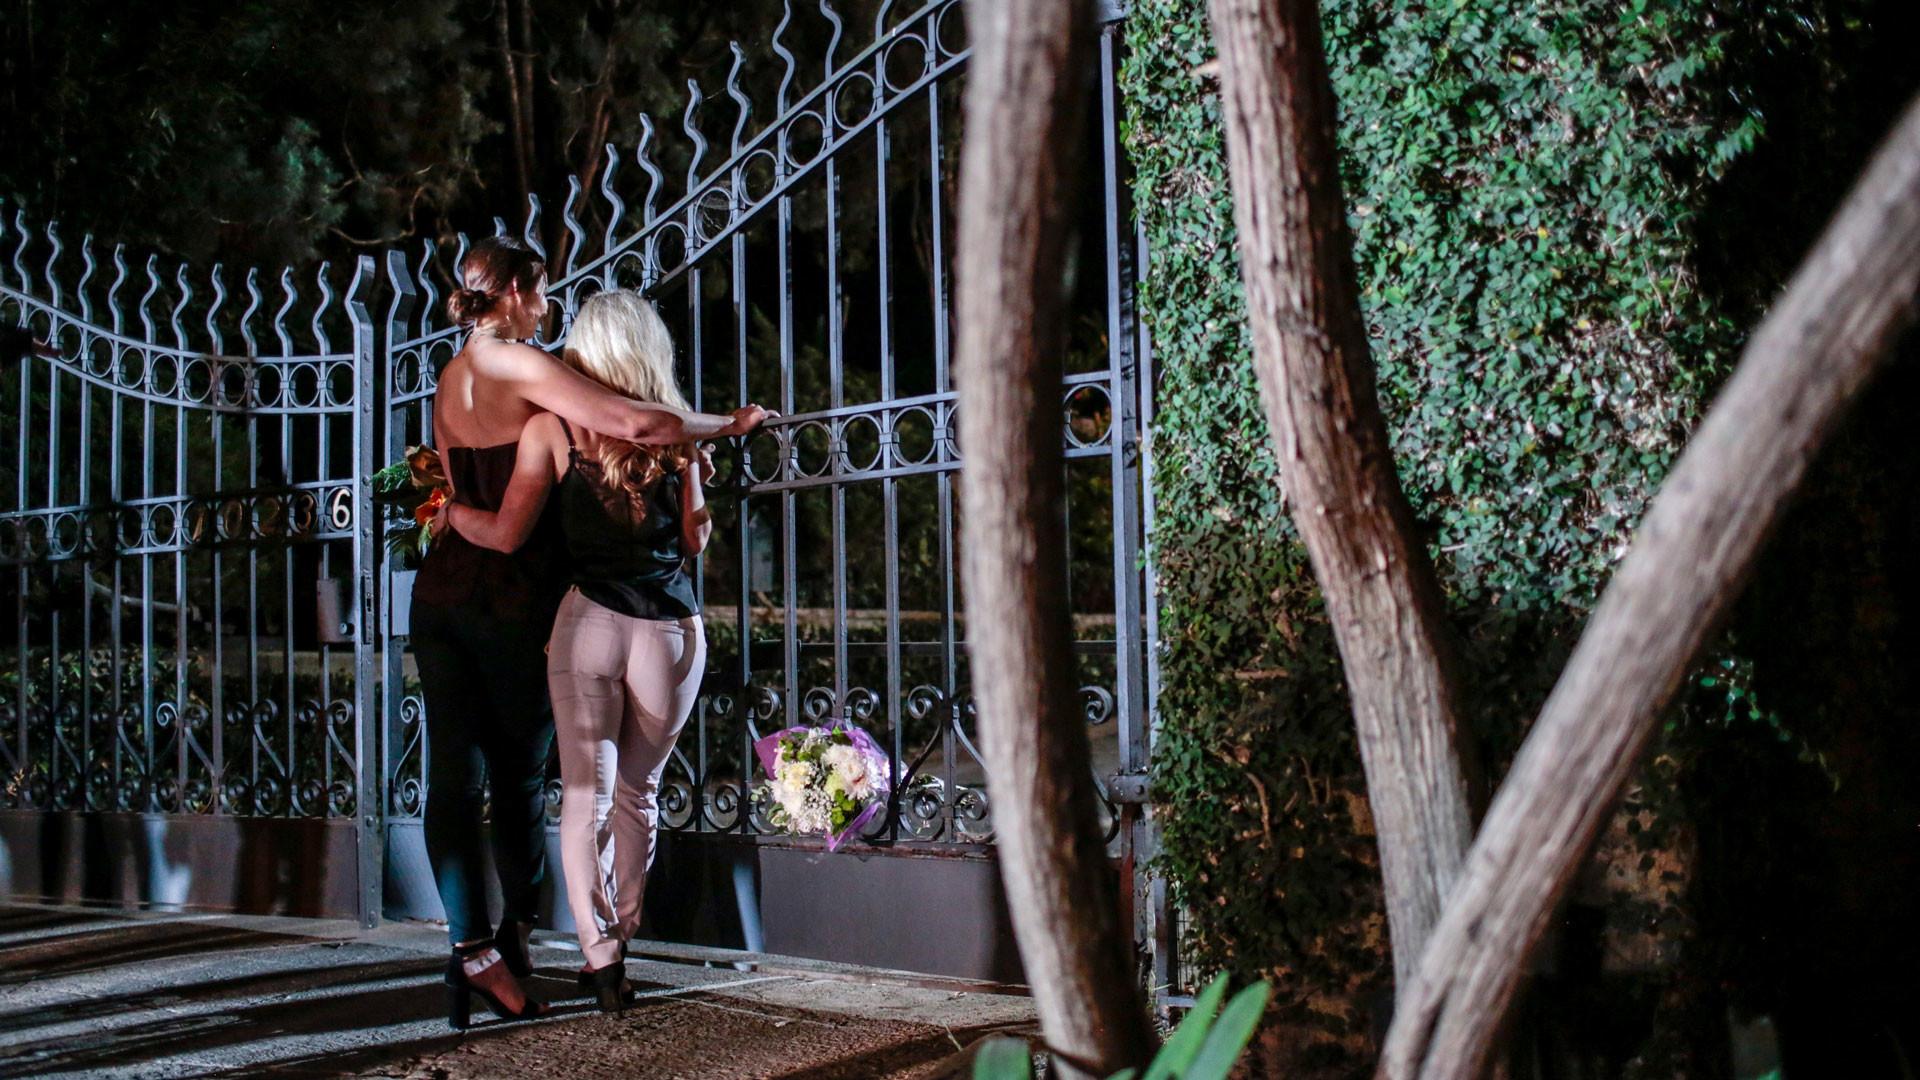 Фанаты у особняка Playboy Mansion. Фото: © REUTERS/ Kyle Grillot